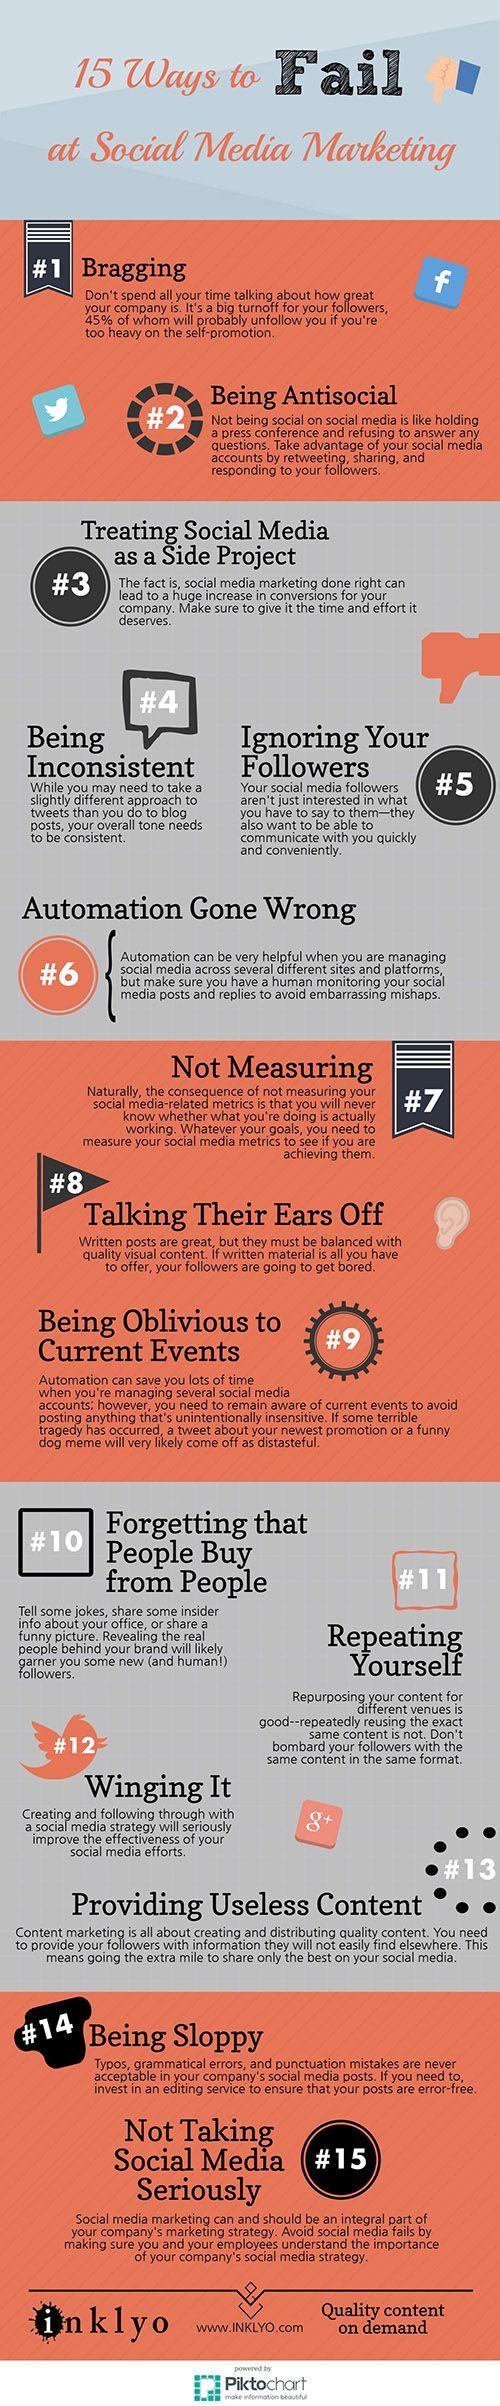 15 ways to fail at social media marketing